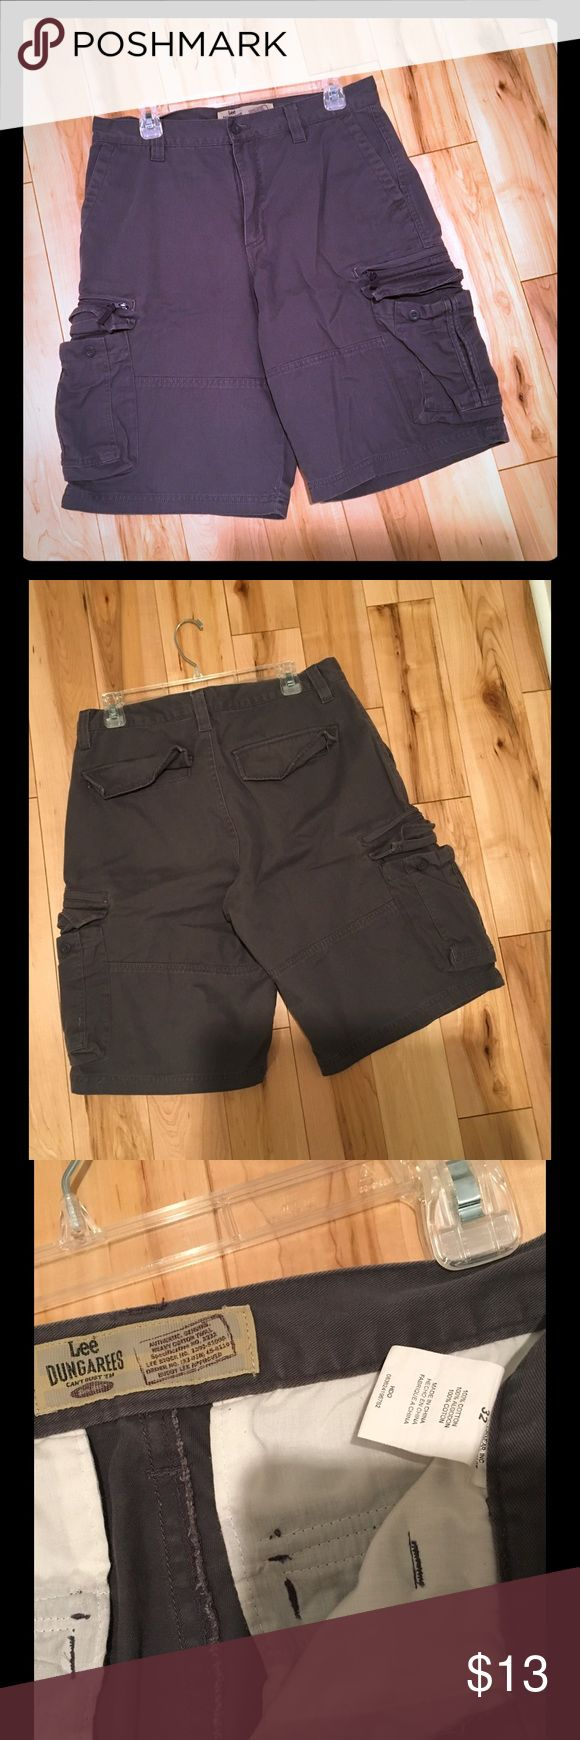 Lee Dungarees Dark Grey Cargo Shorts size 32 Lee Dungarees Dark Grey Cargo Shorts size 32 Lee Shorts Cargo